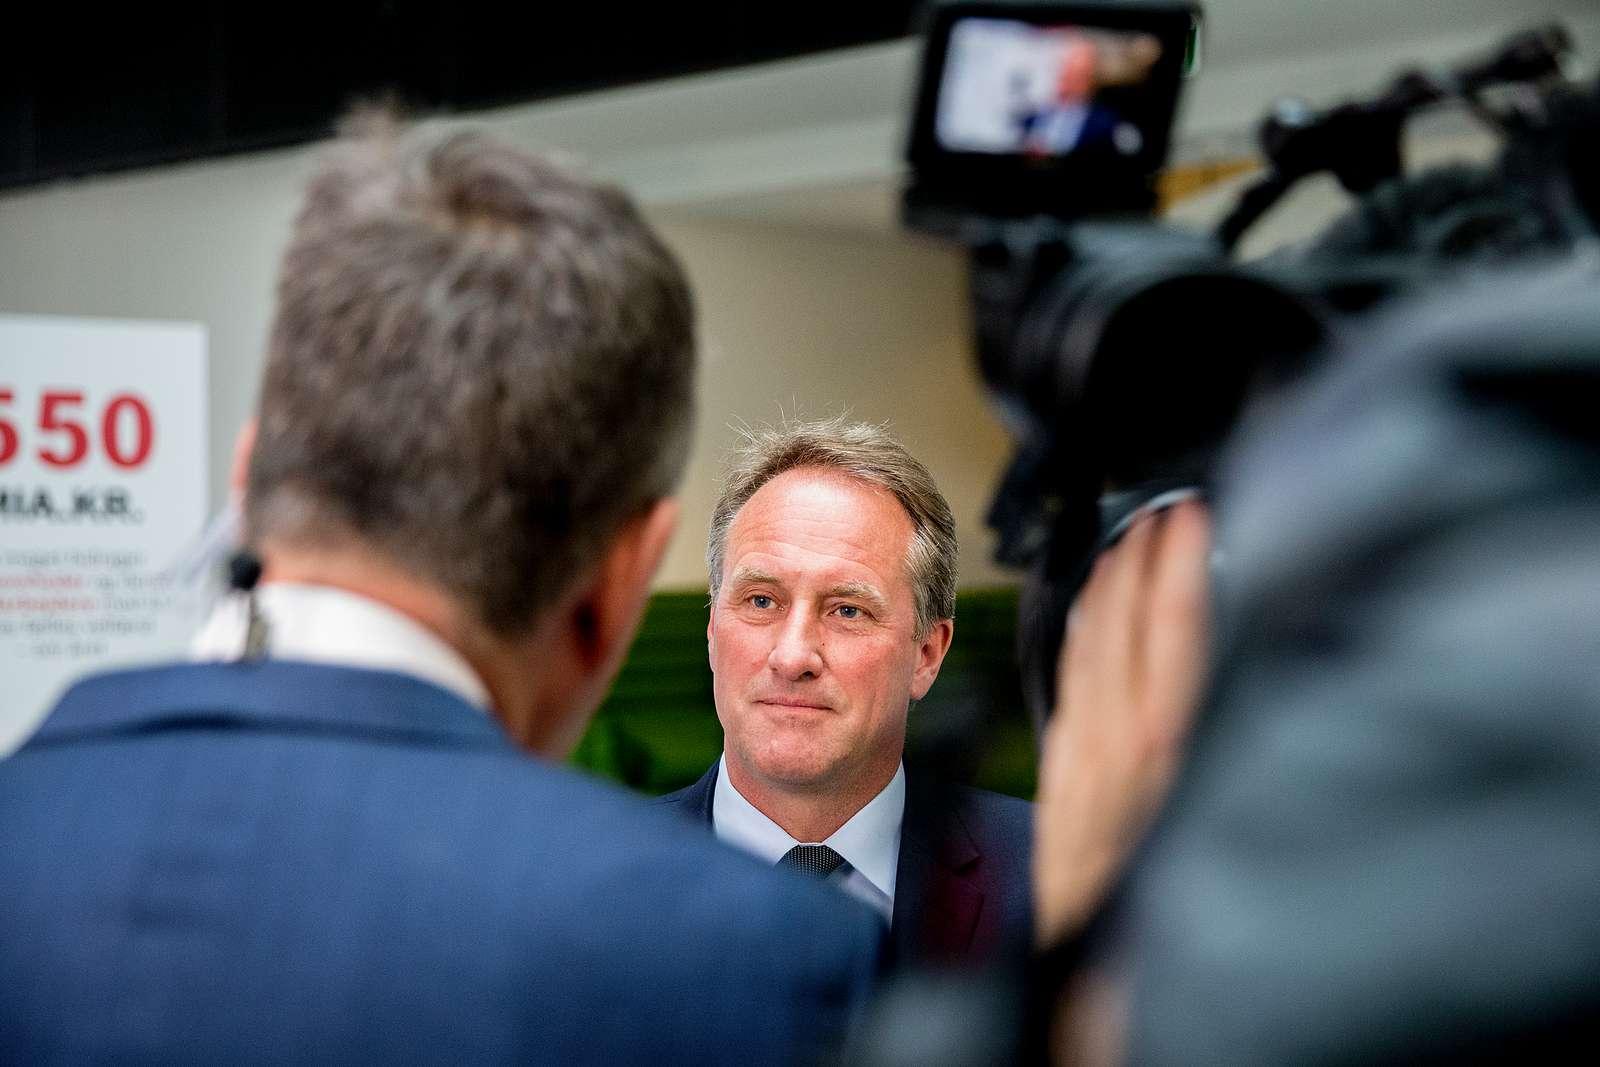 Administrerende direktør i Dansk Industri, Lars Sandahl Sørensen, der har været med til at forhandle den nye lønkompensationsaftale. Pressefoto: for DI, Thomas Arnbo.